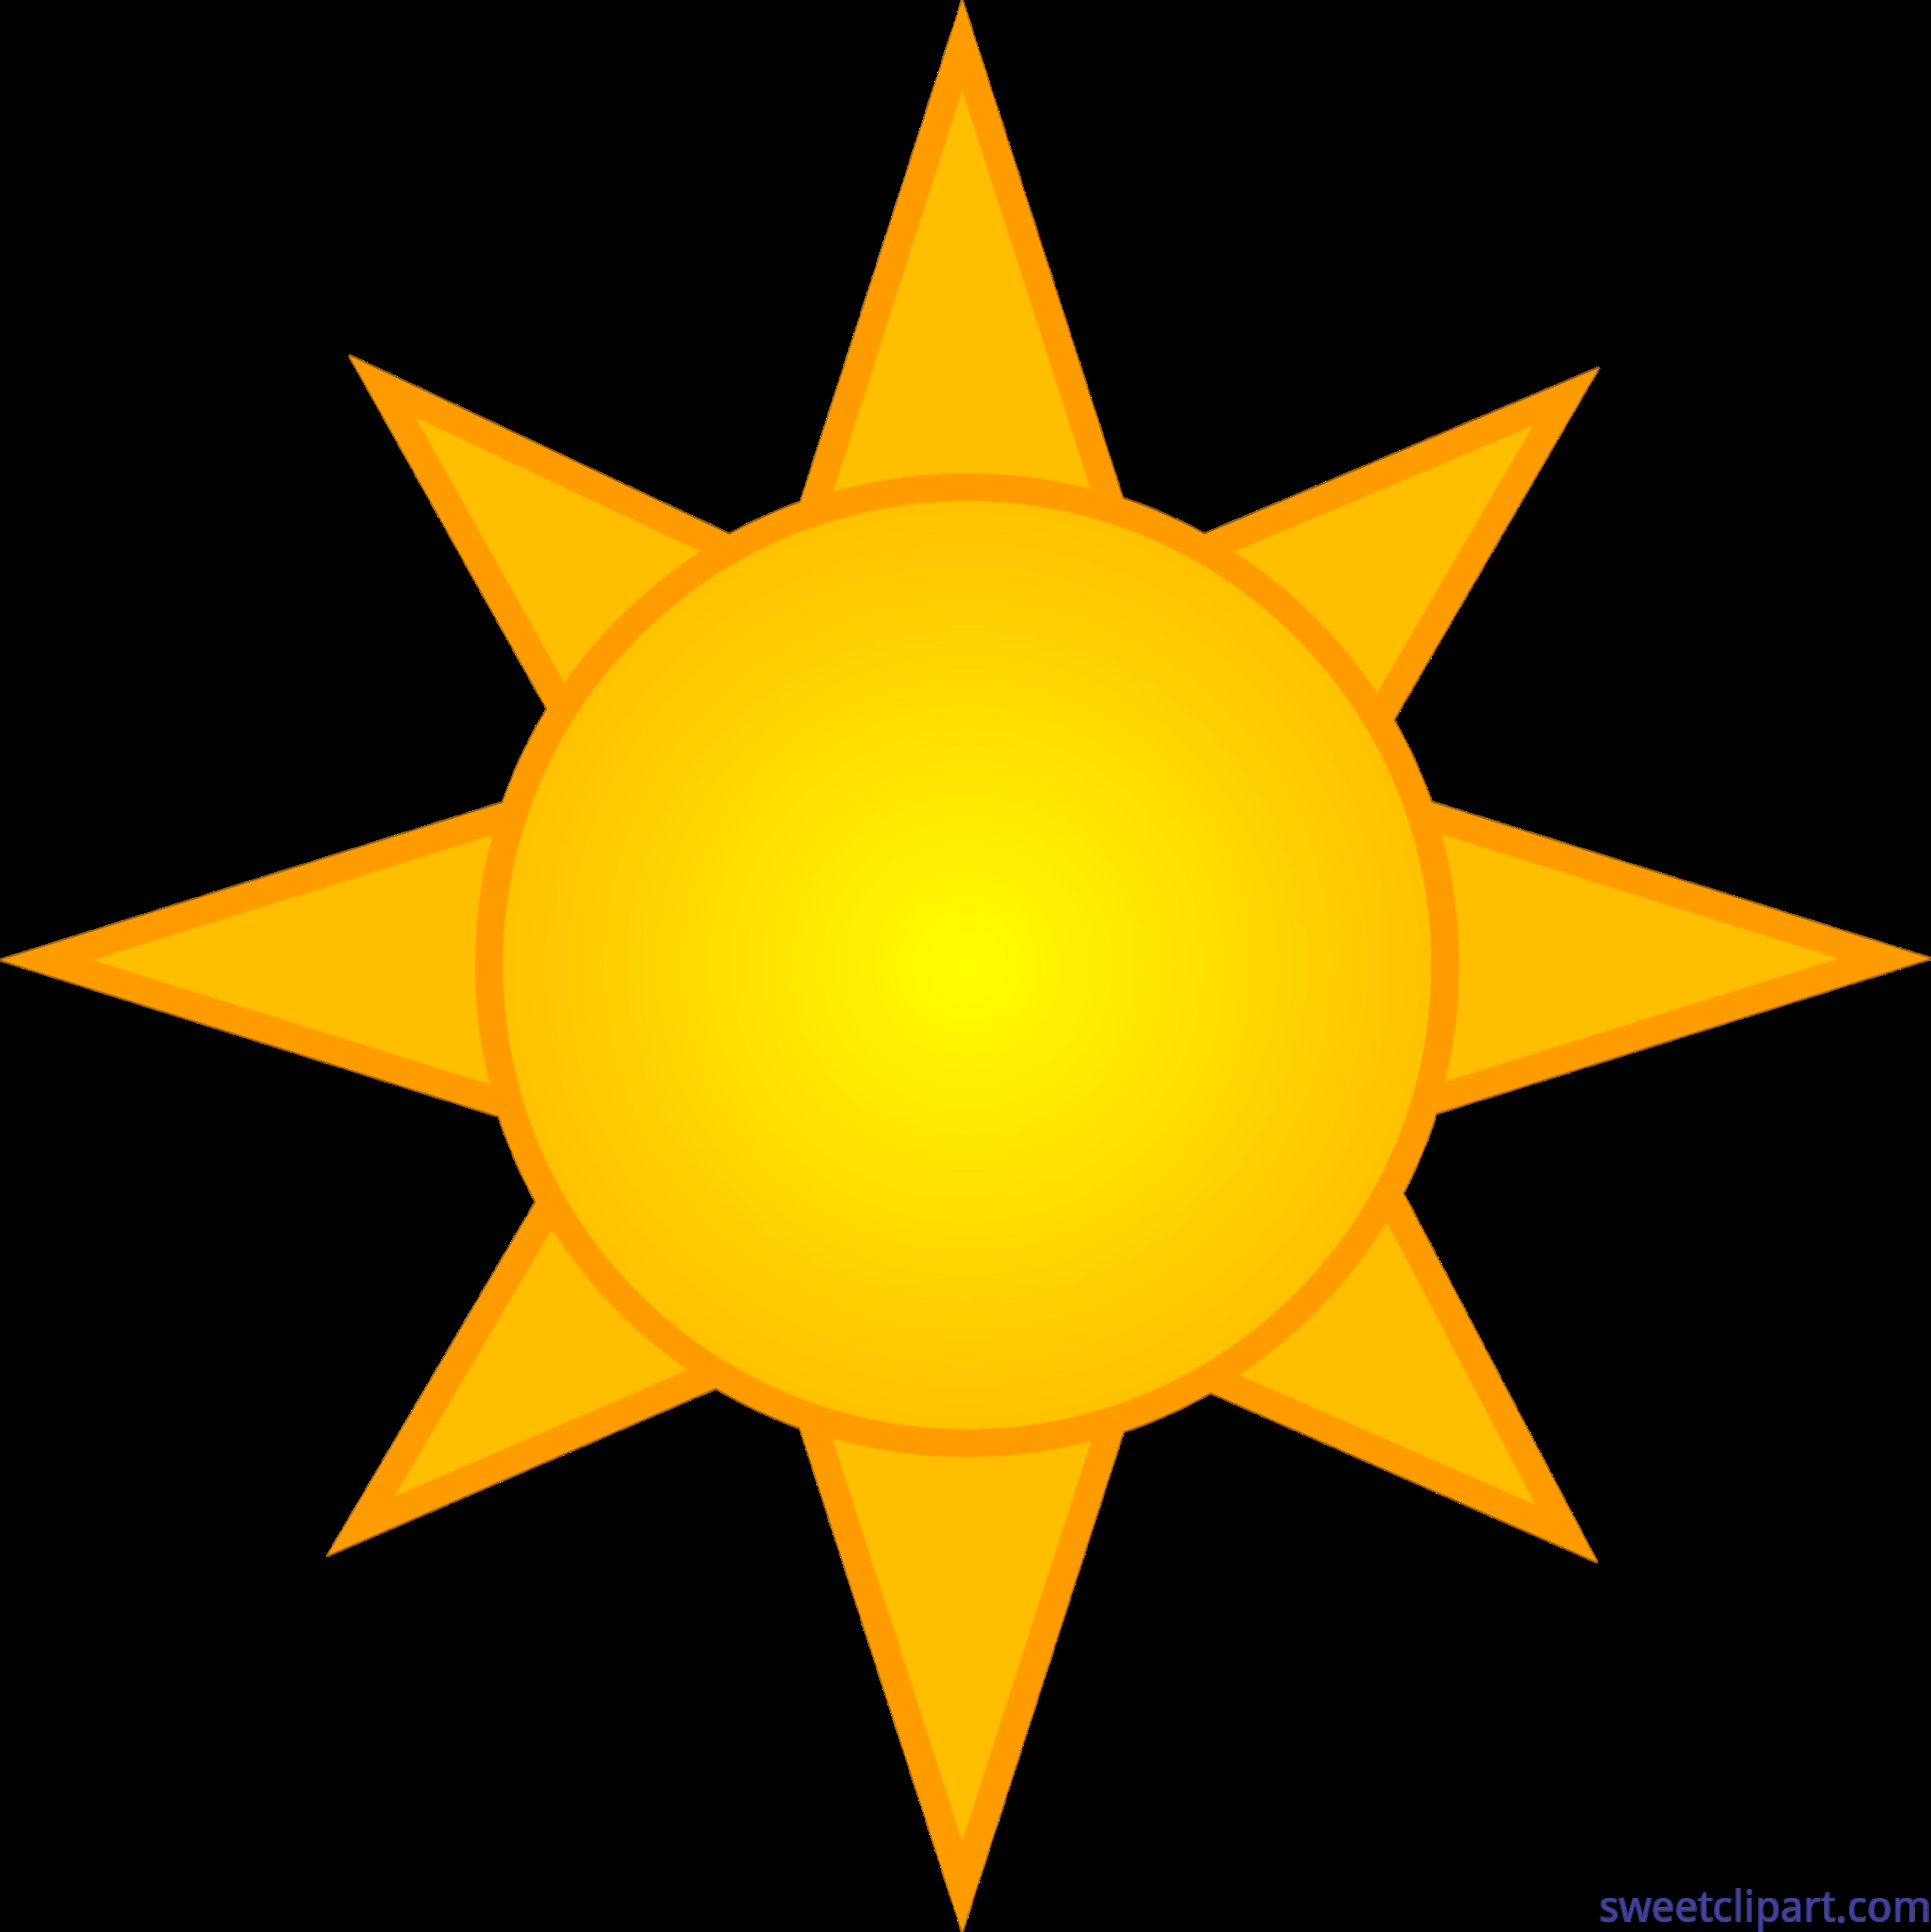 Yellow symbol clip art. Clipart sun orange